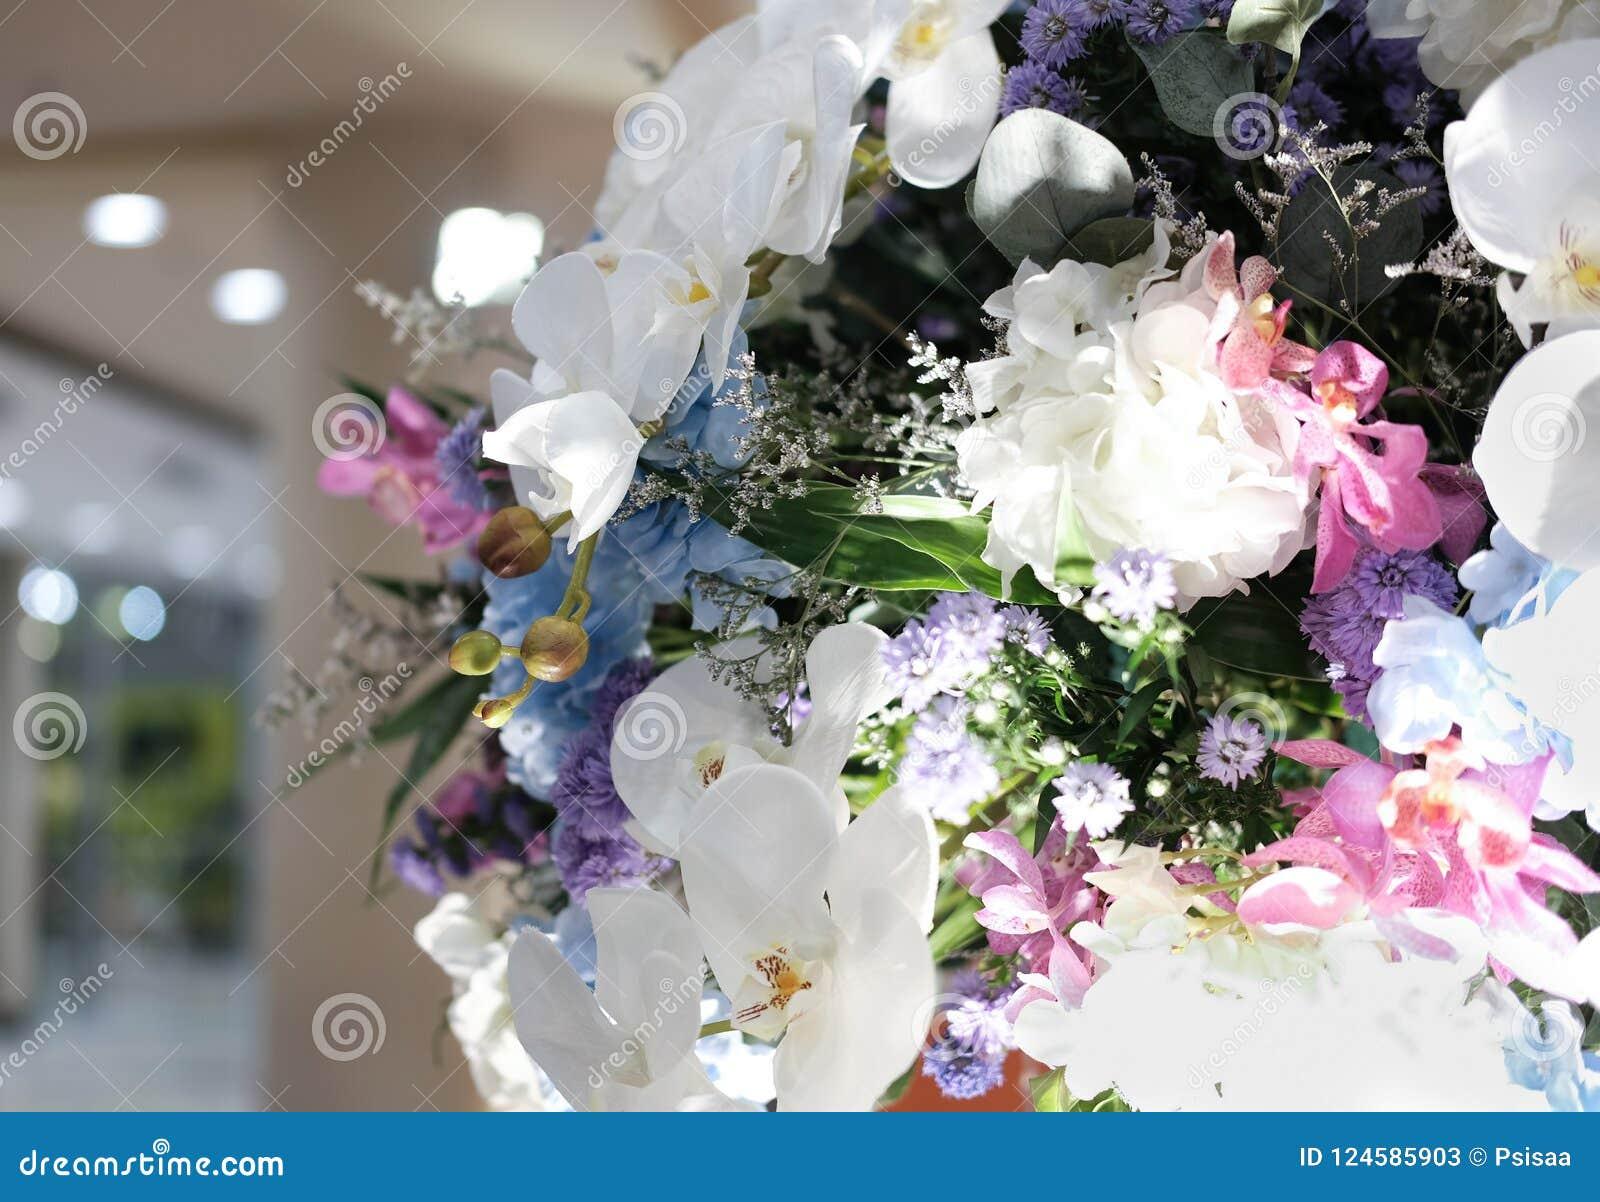 Artificial white orchid flower bouquet stock image image of design download artificial white orchid flower bouquet stock image image of design decoration 124585903 izmirmasajfo